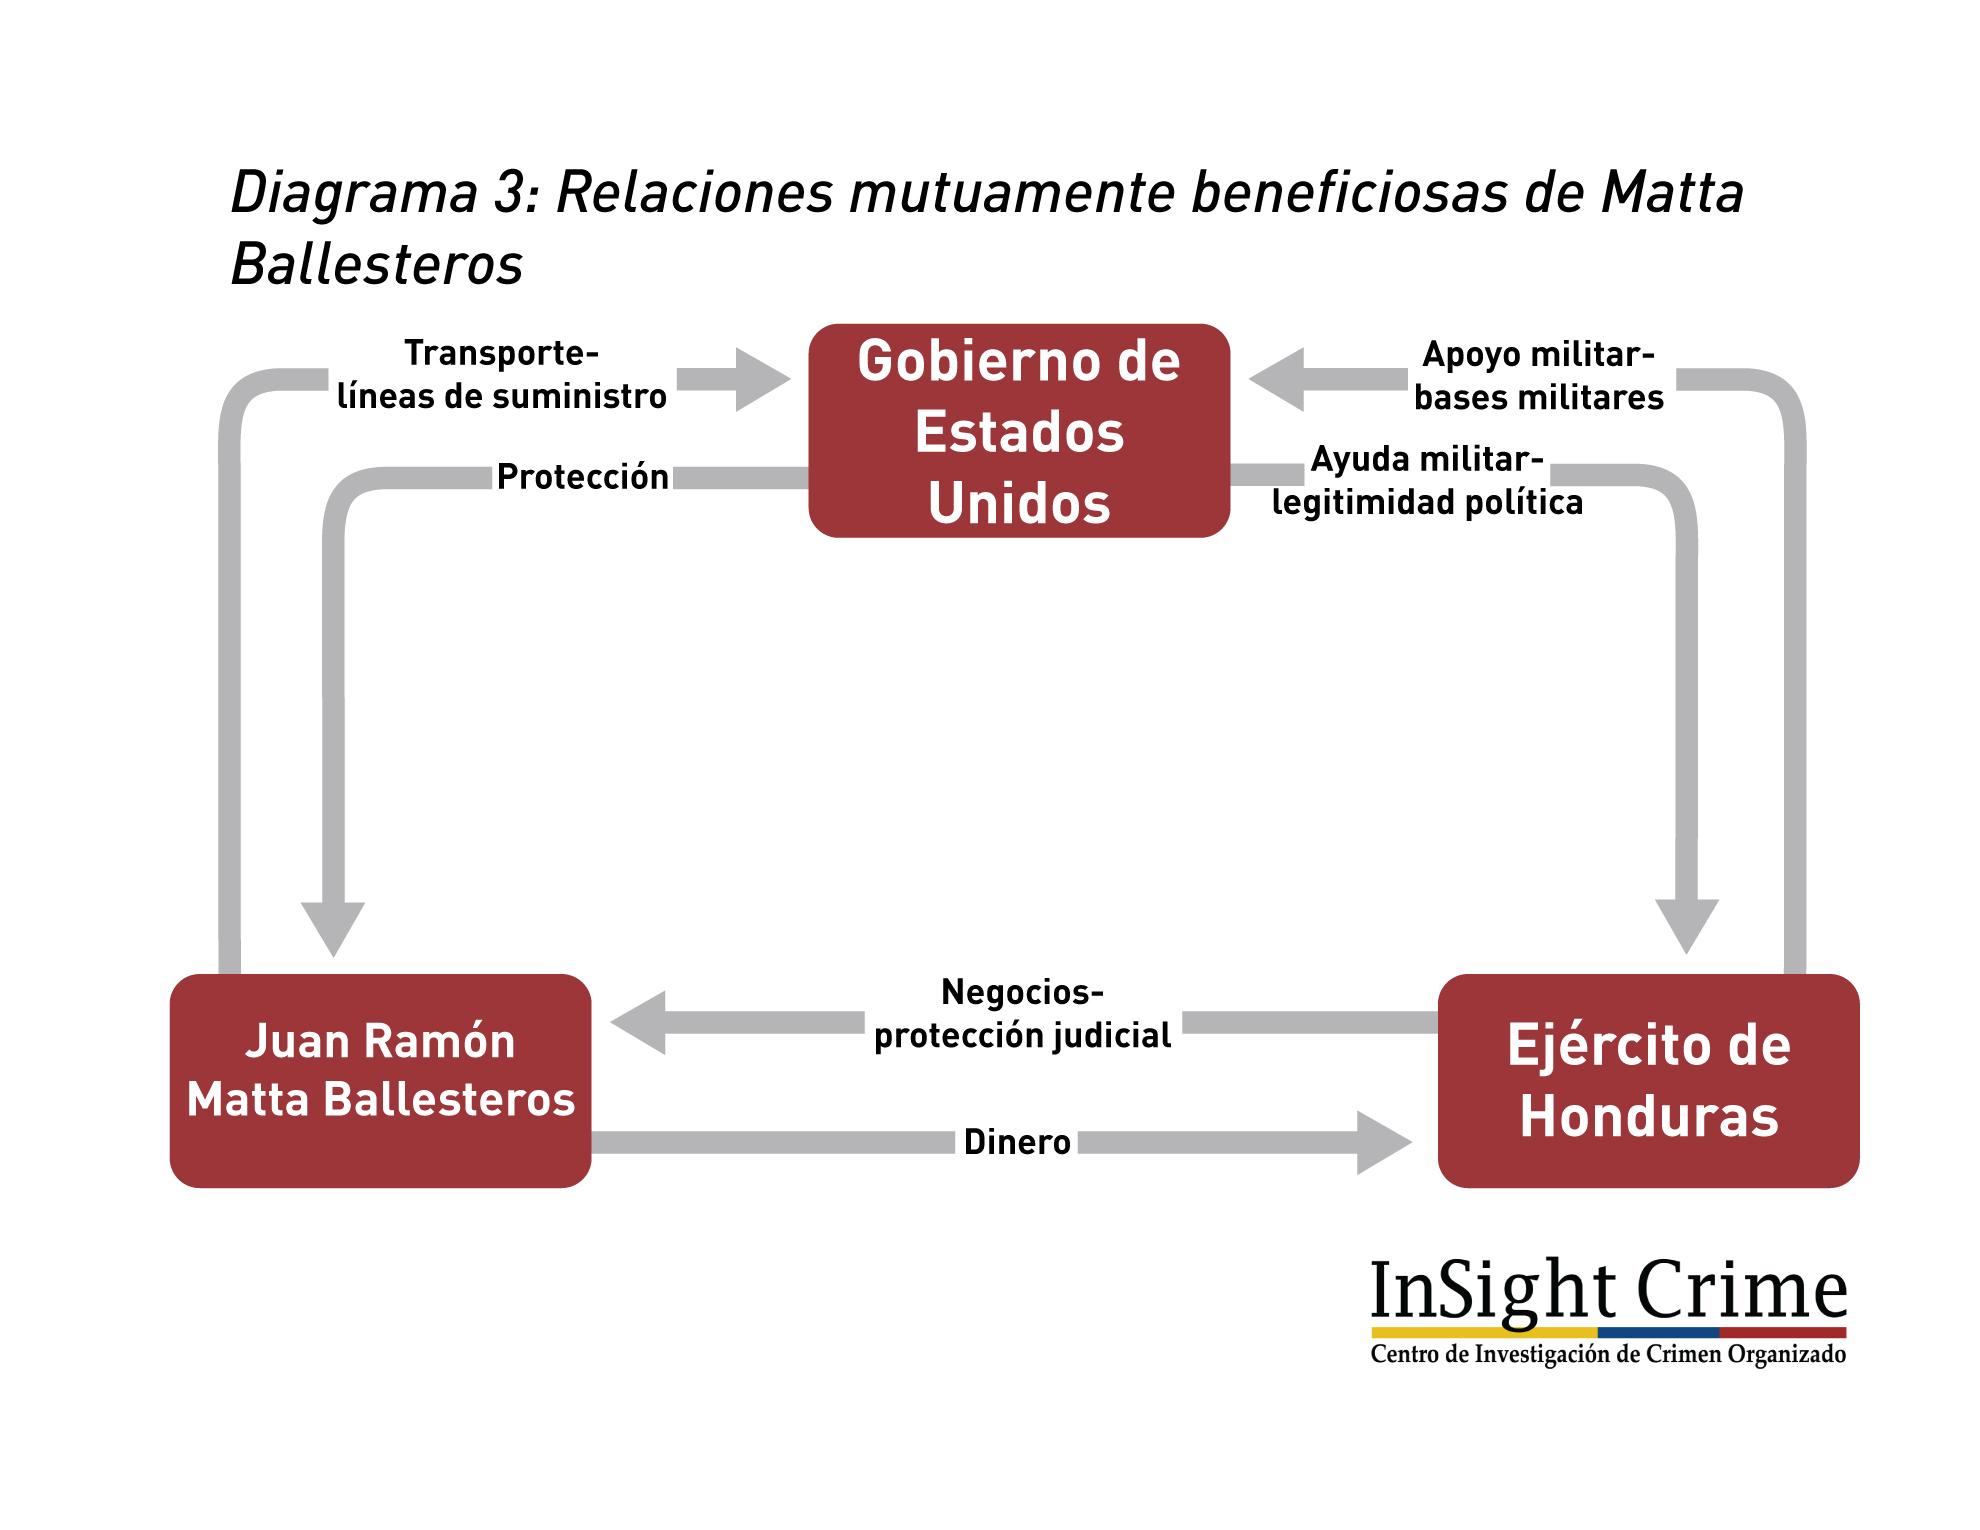 MattaBallesterosMutualBenRelationEspanol